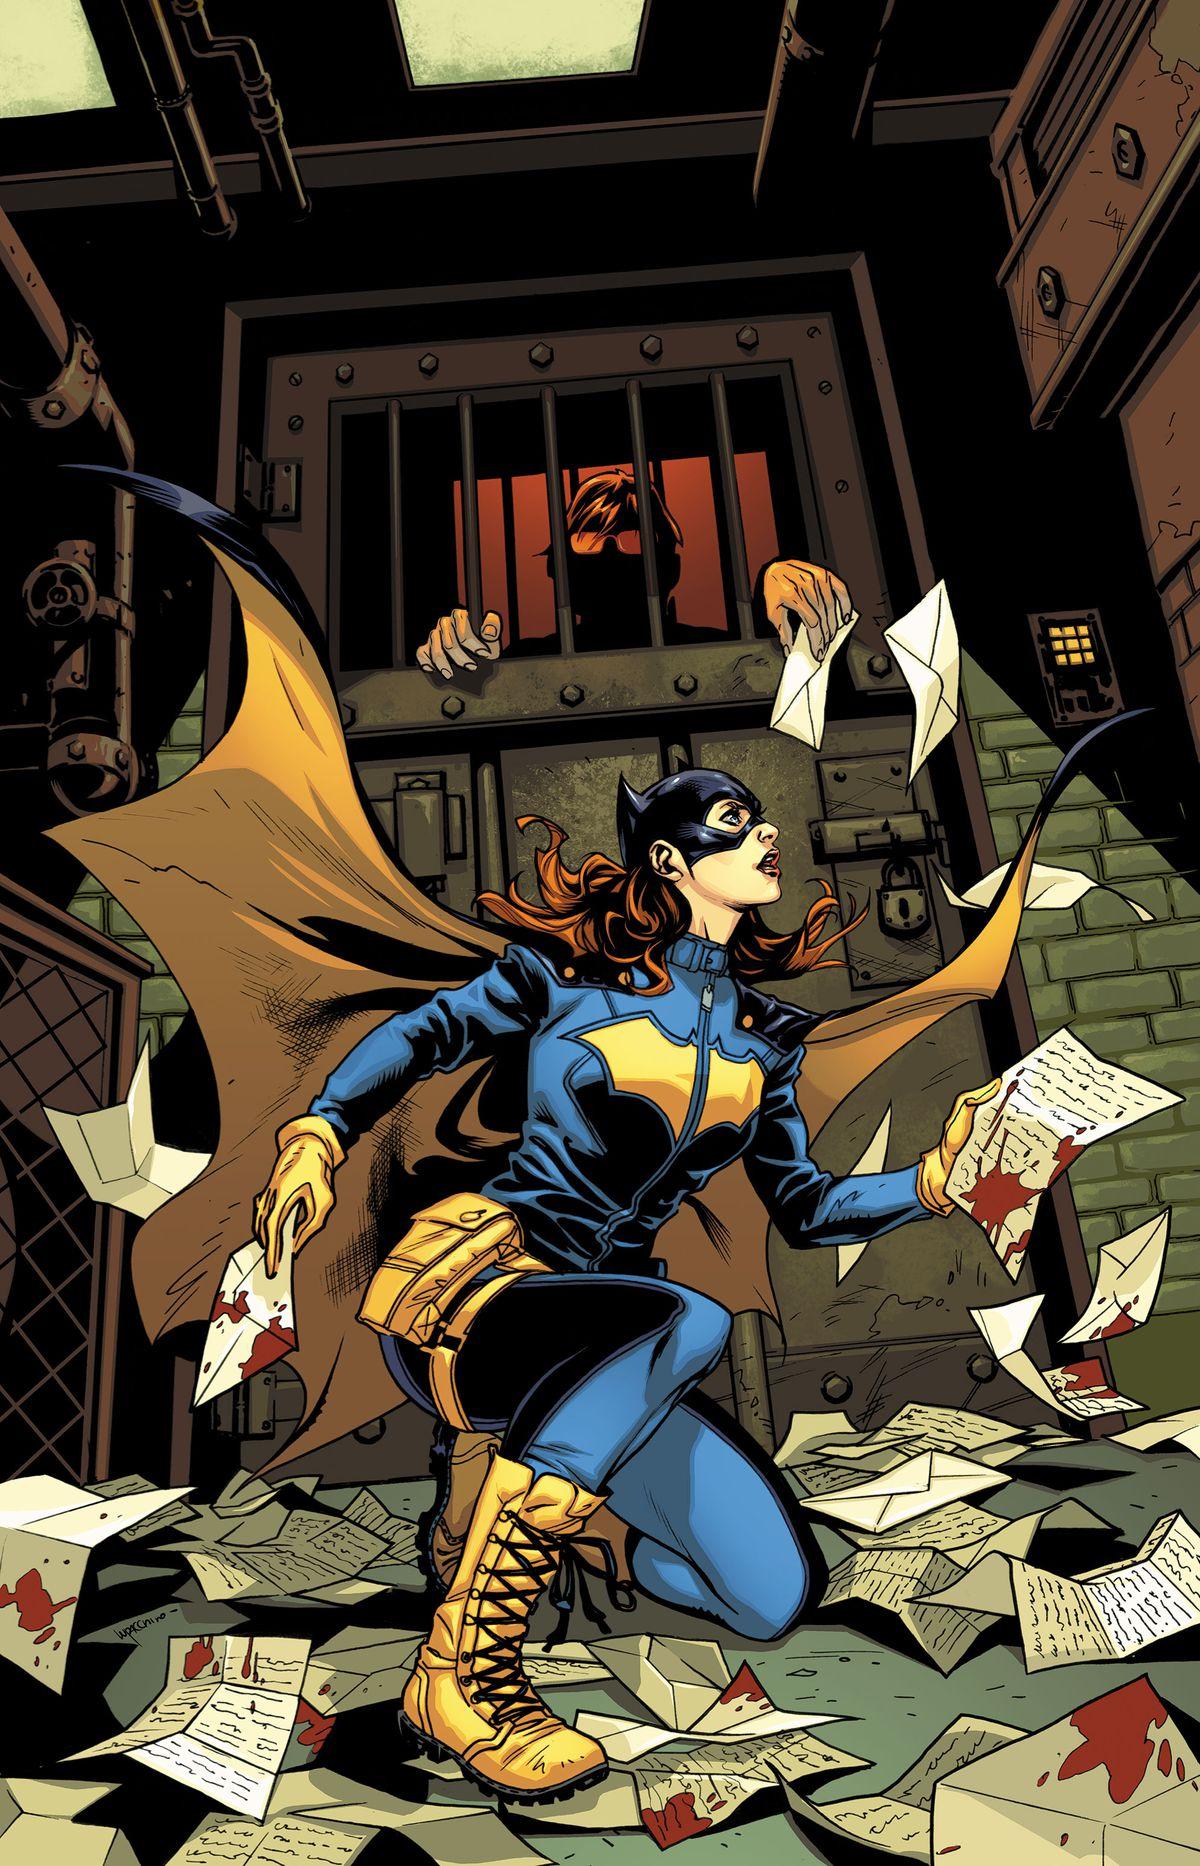 Batgirl Annual #2 - new costume